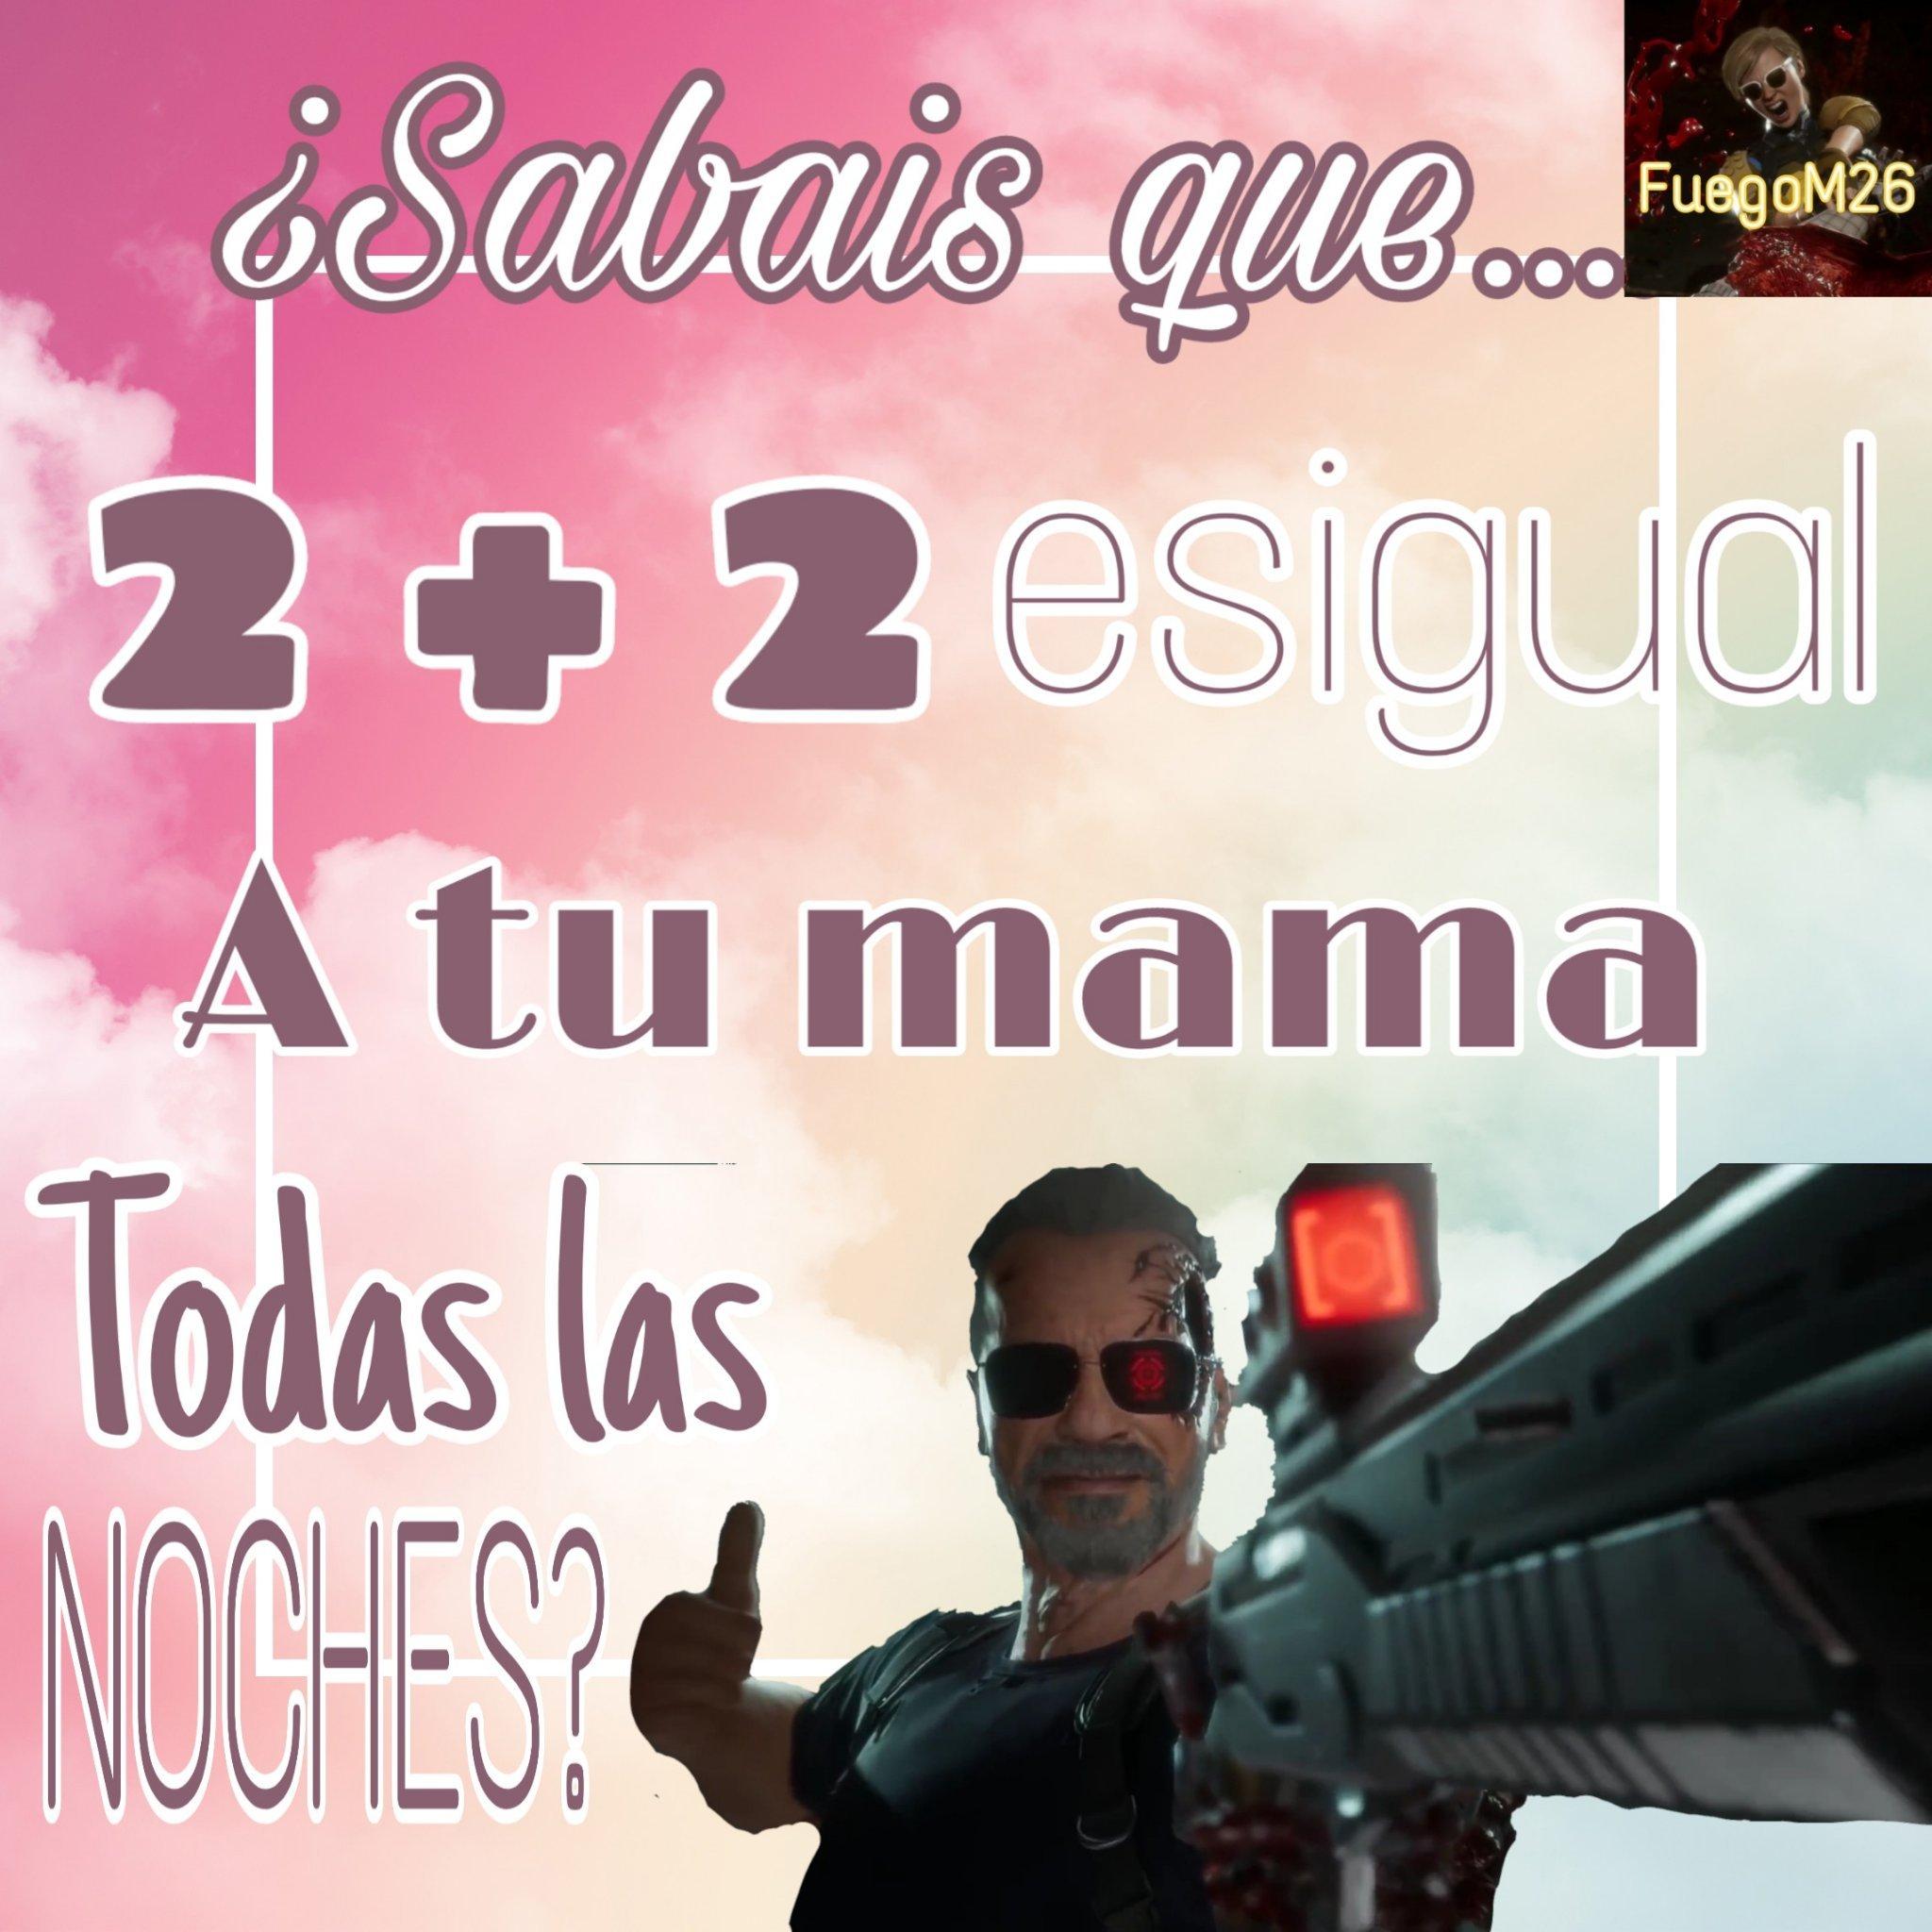 Arnold ;) - meme